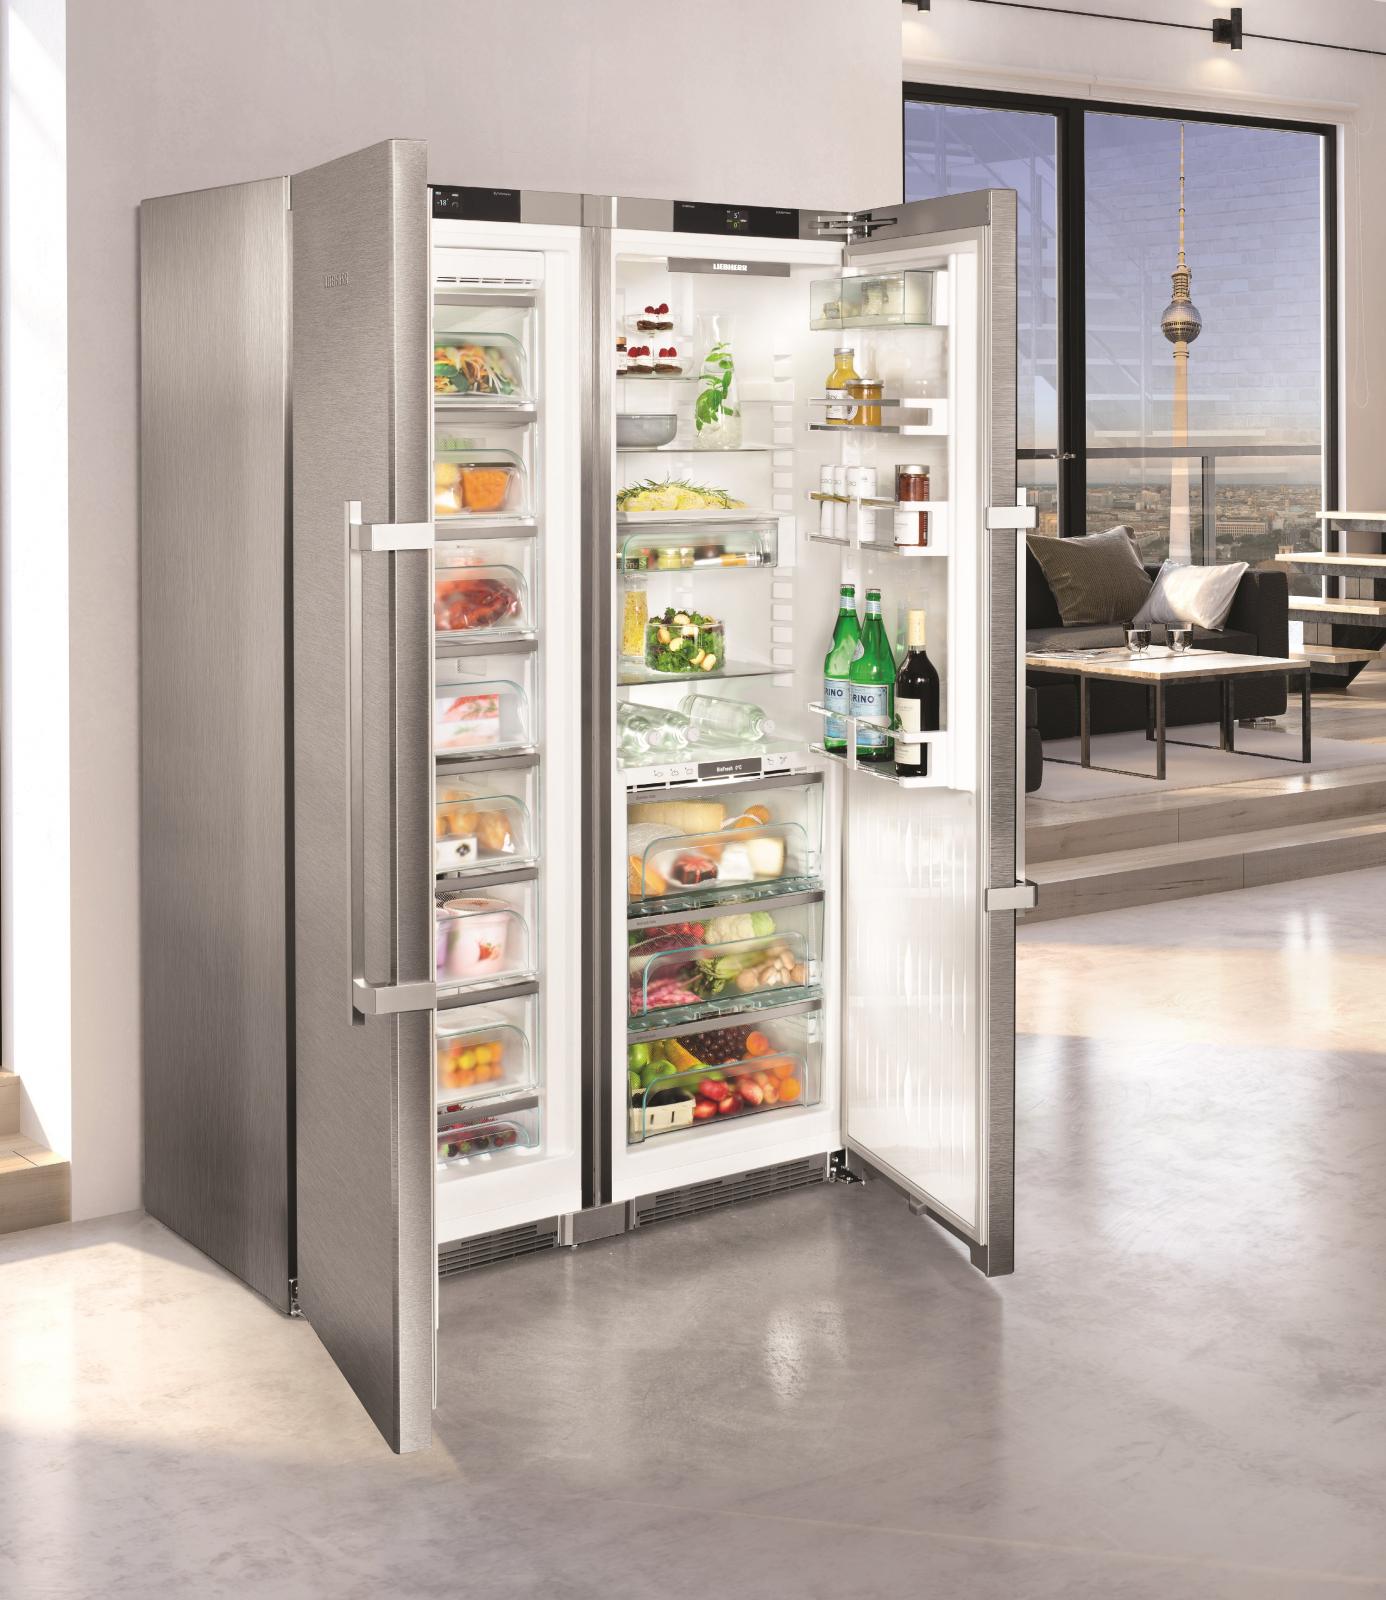 купить Side-by-Side холодильник Liebherr SBSes 8663 Украина фото 7